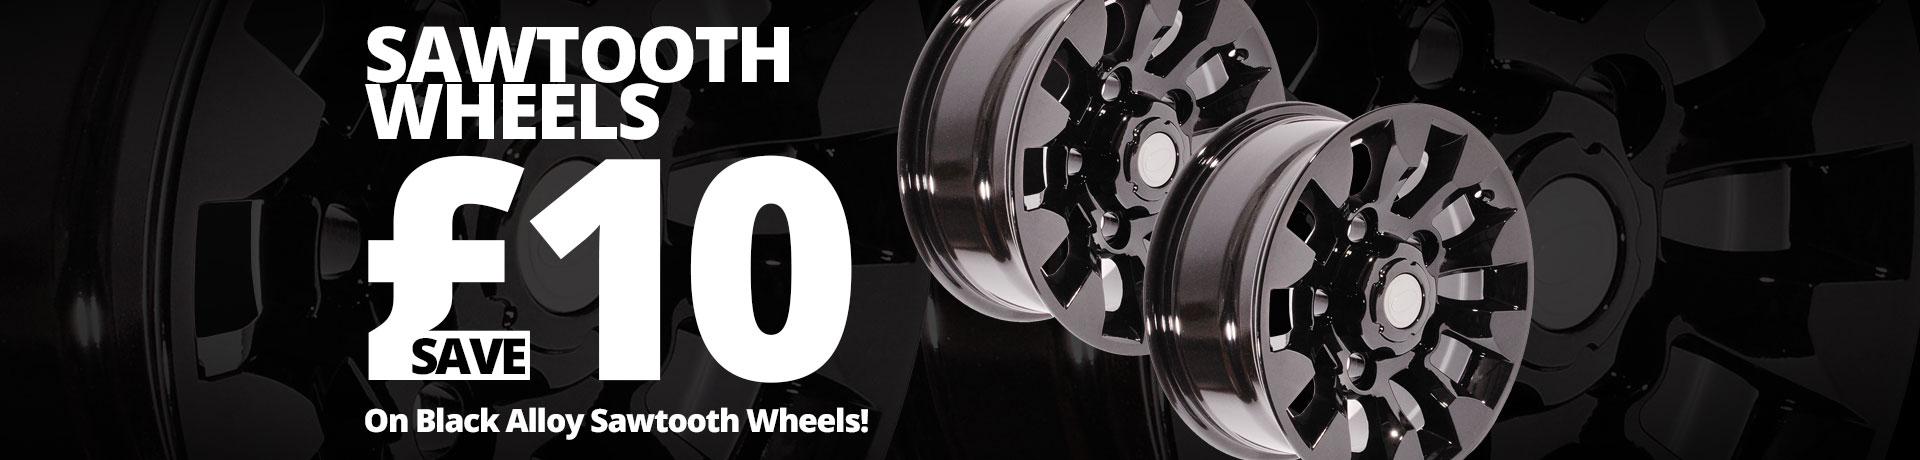 Black Alloy Sawtooth Wheels